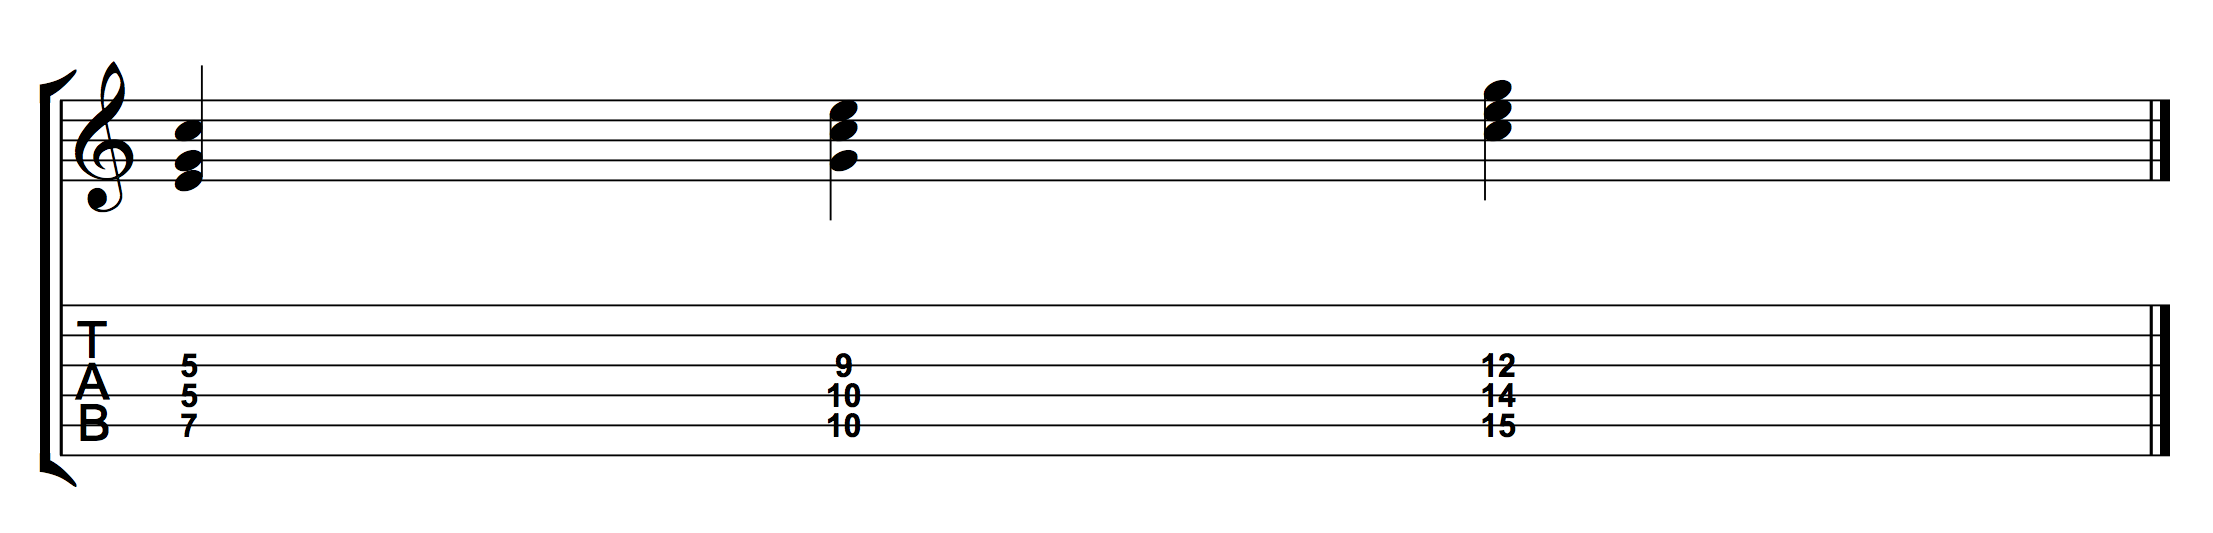 C Major Triad 3 Shapes 345